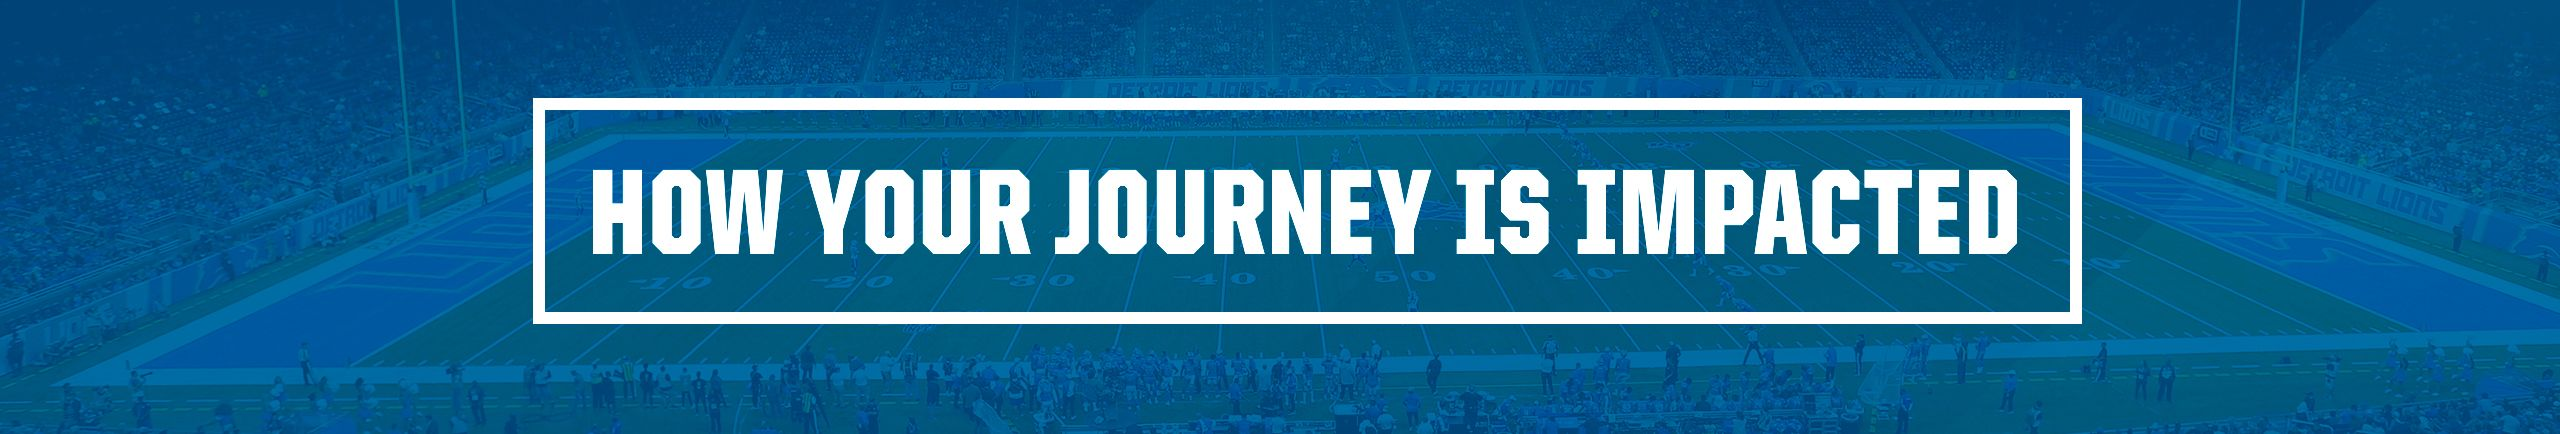 how-your-journey-header